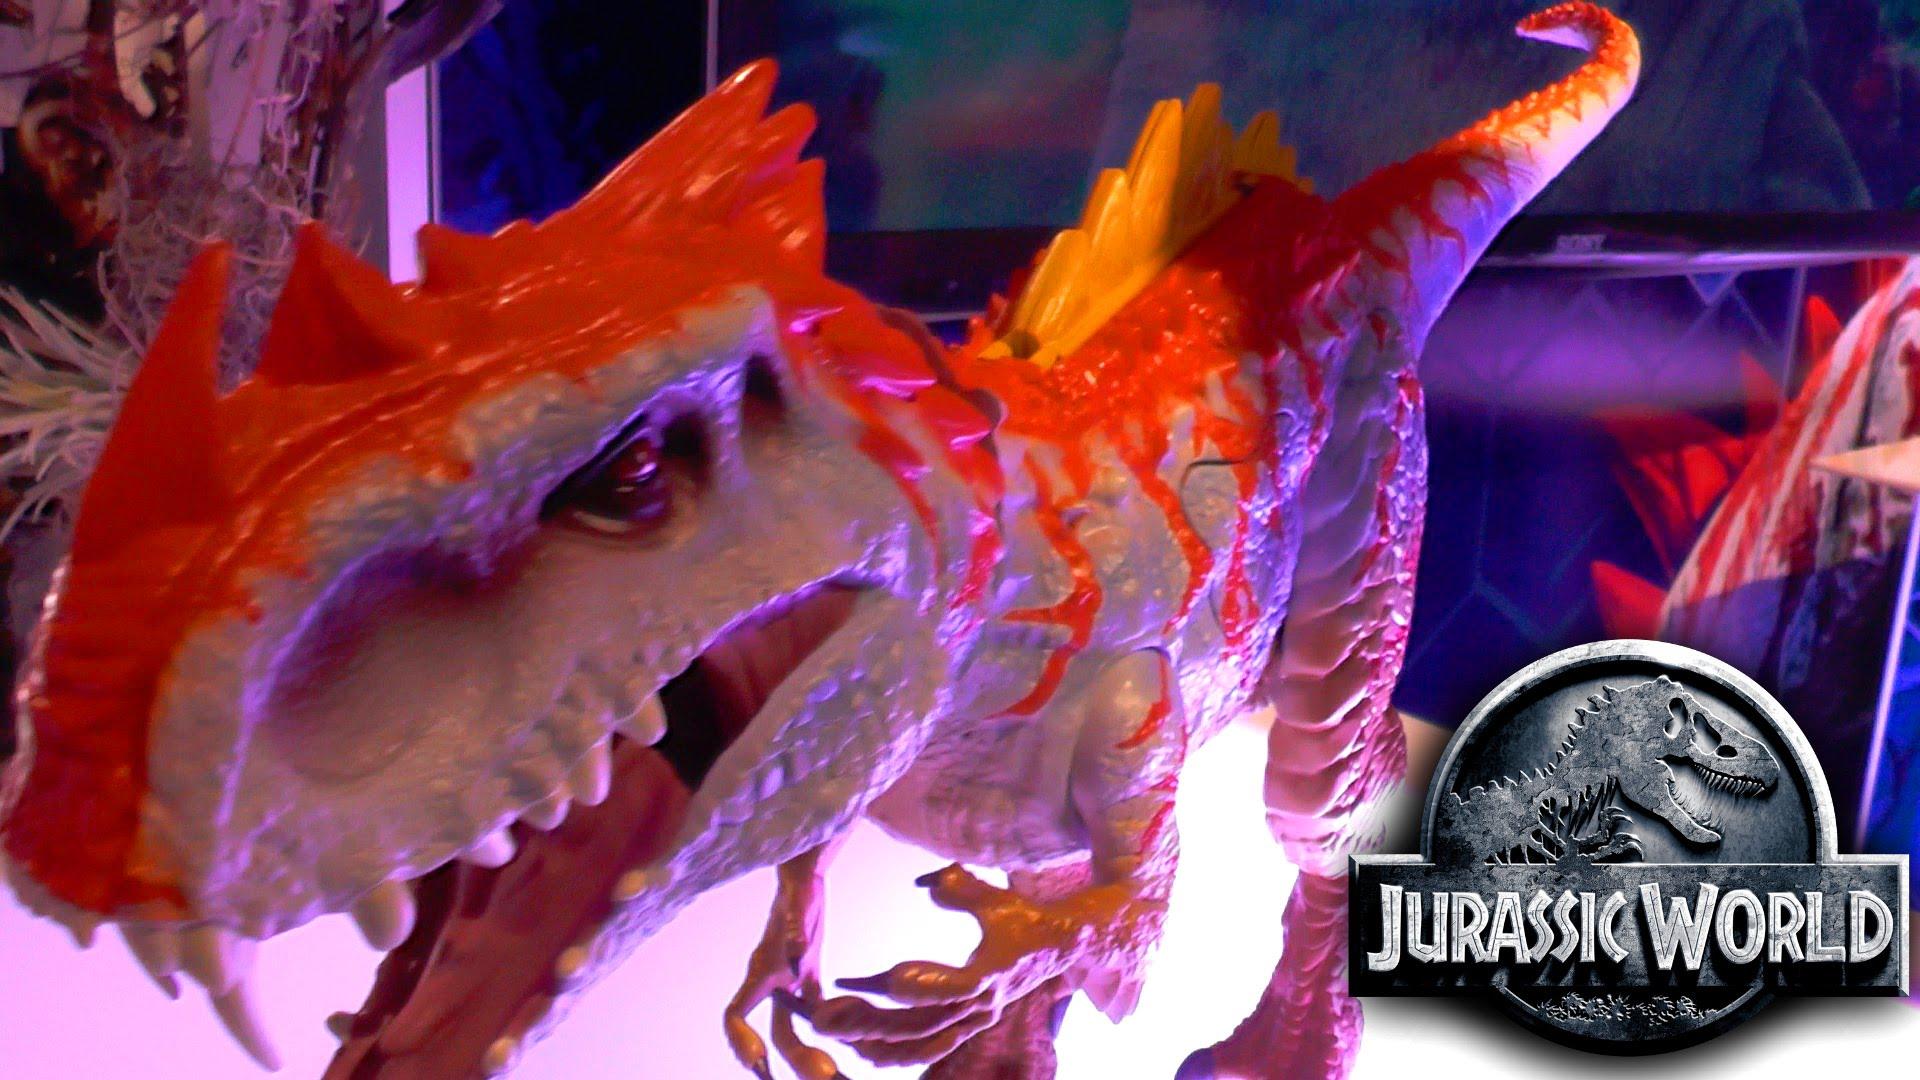 Jurassic World 2016 – Hybrid Rampage Indominous Rex